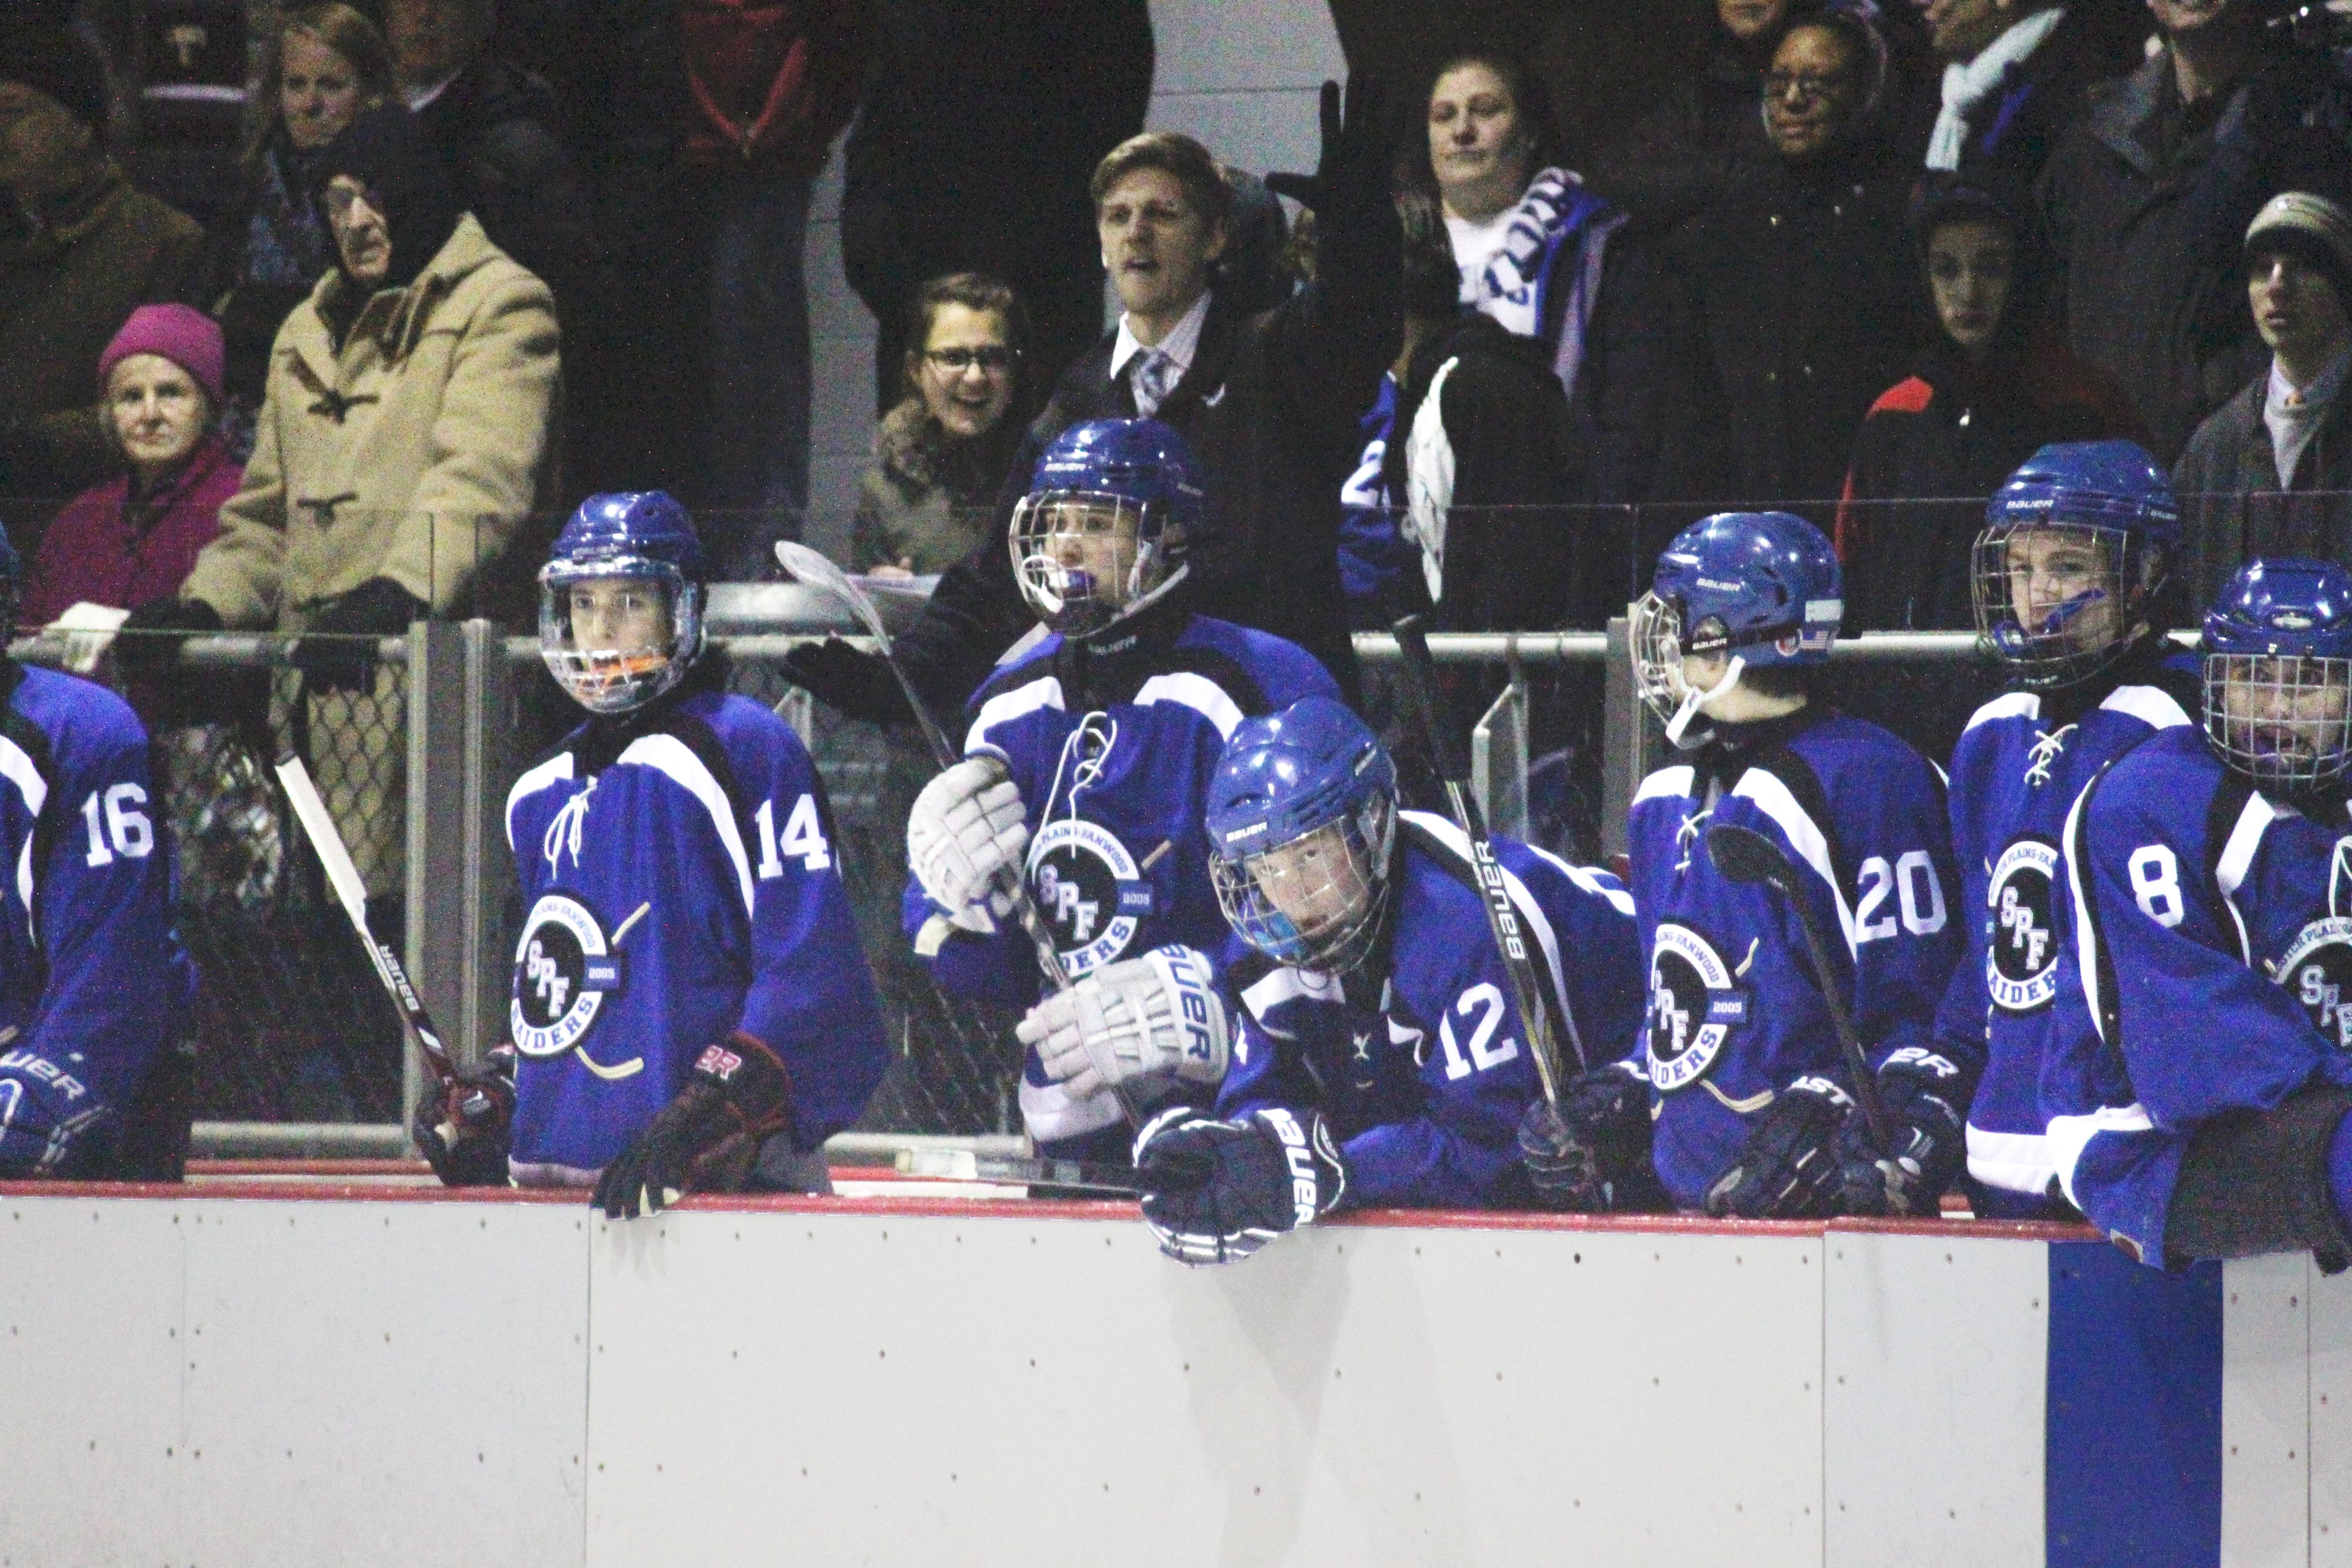 6a56ac246cfca34c6bc8_hockey.jpg